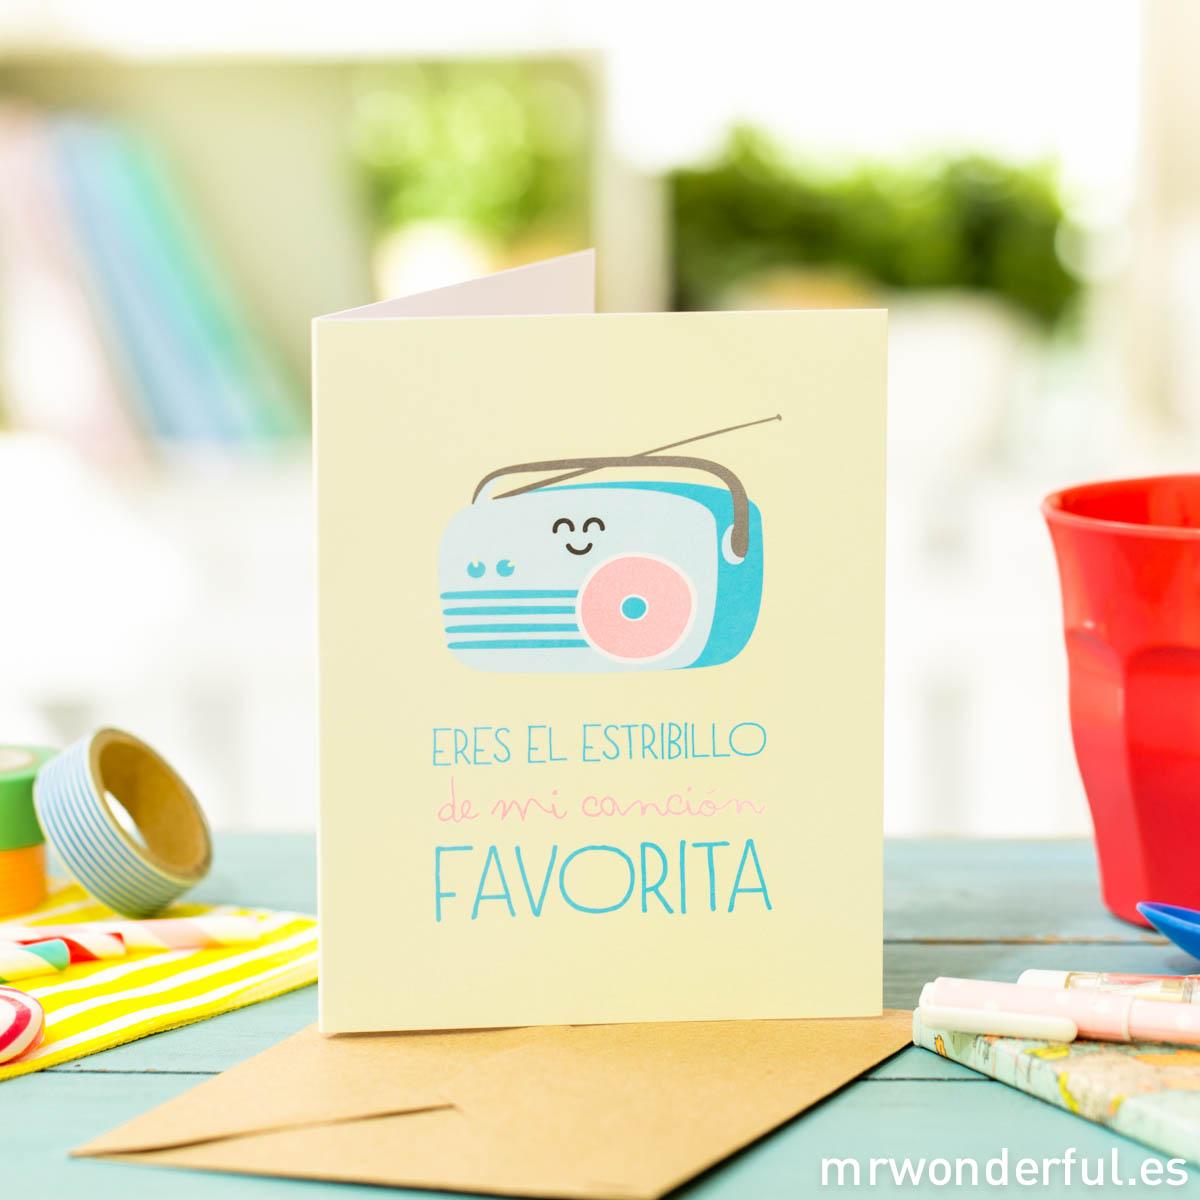 mrwonderful_TARJETAS-WONDER-51_Pack-surtido-felicitaciones-summer-castellano-2